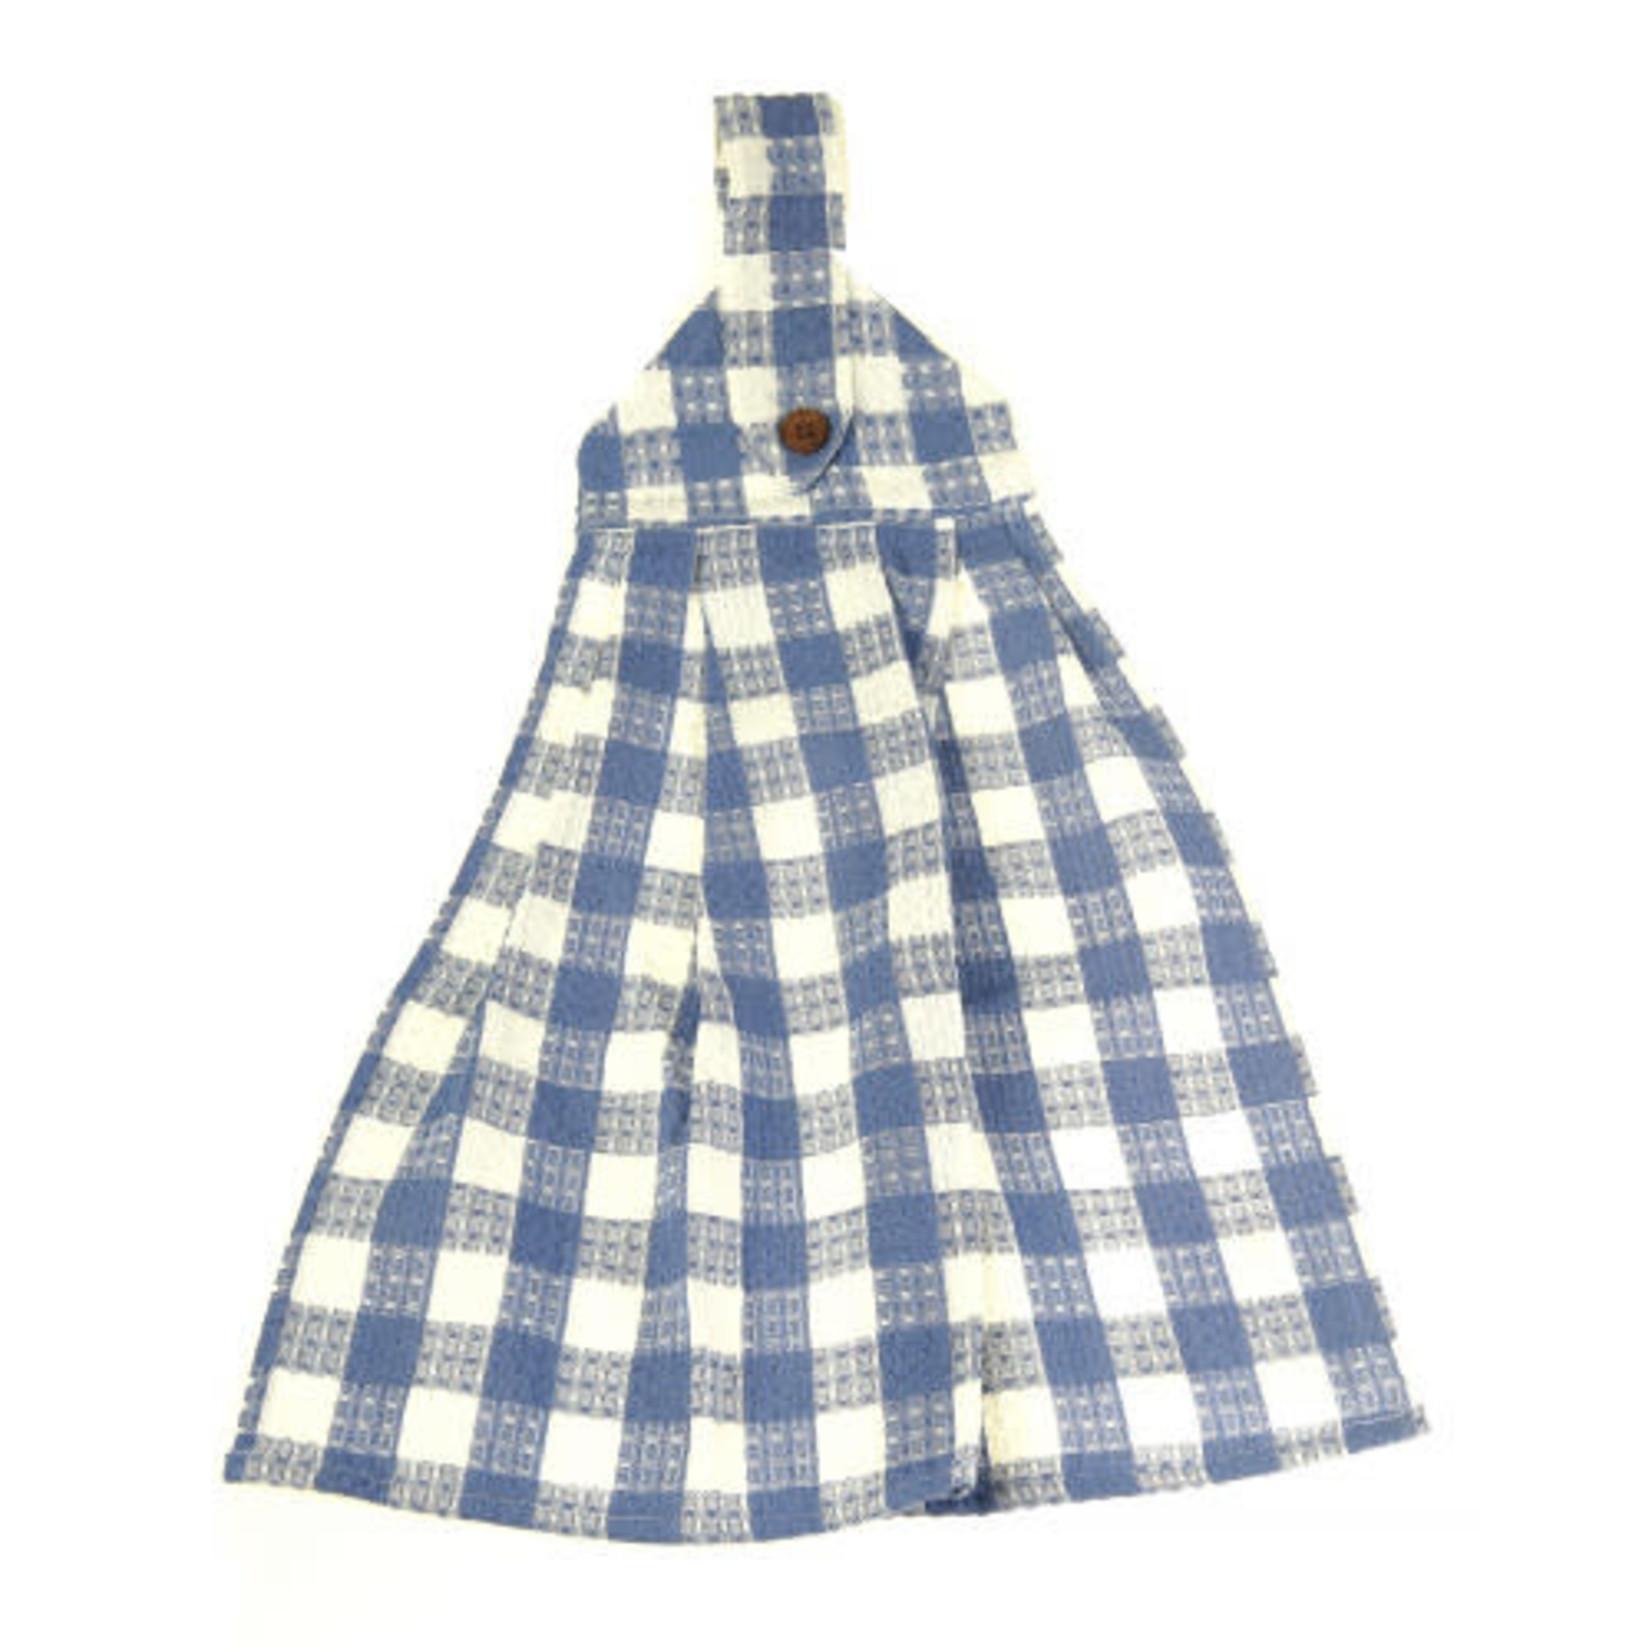 Hanging Tie Button Towel